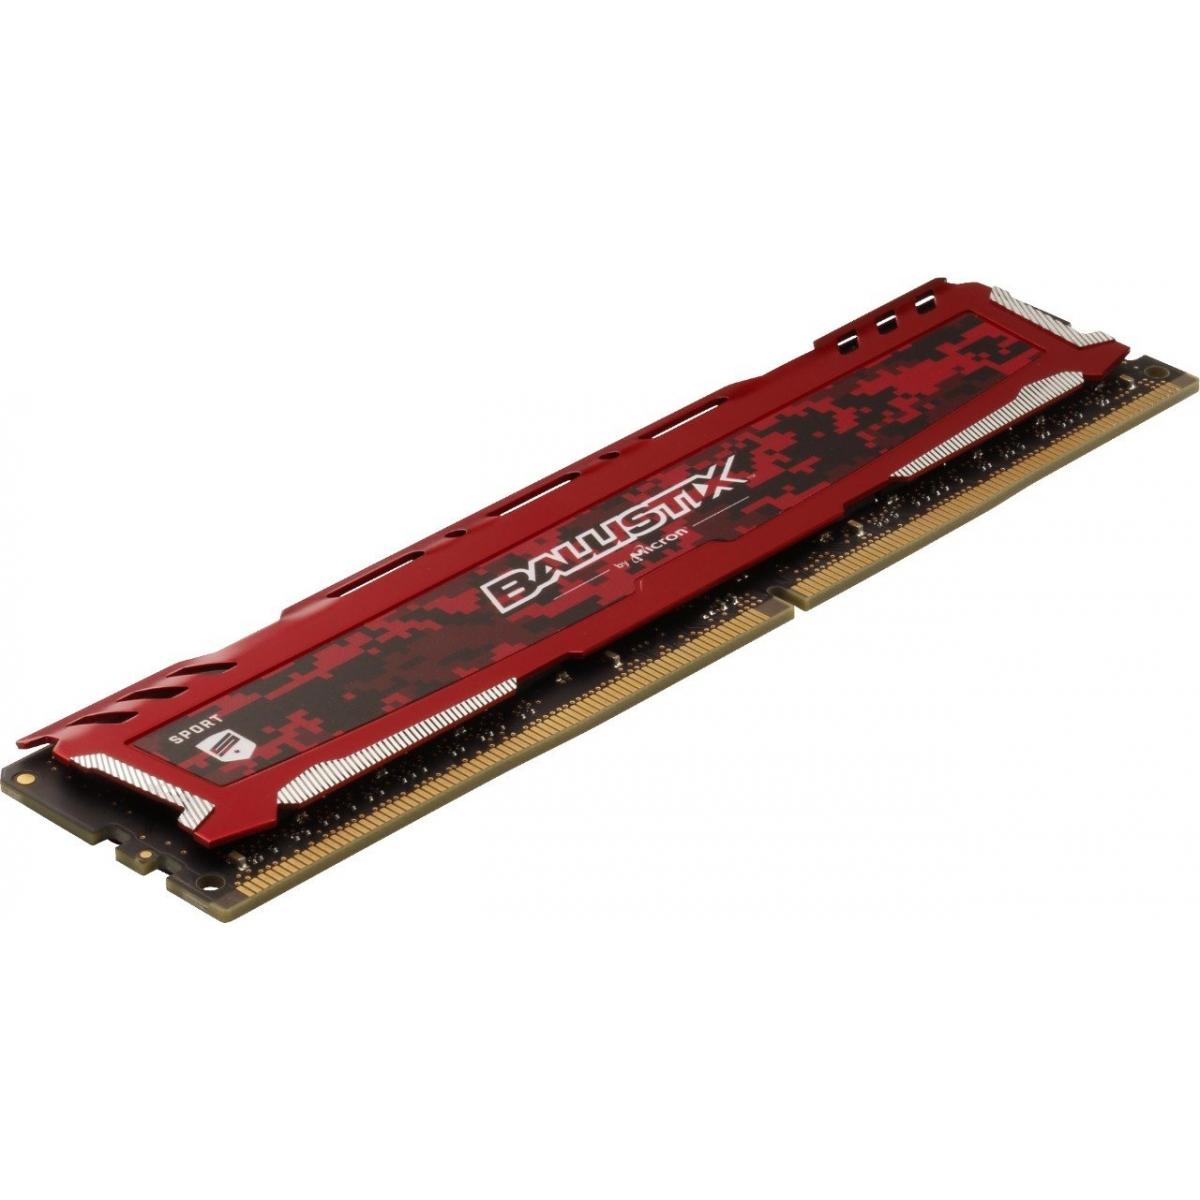 Memória DDR4 Crucial Ballistix Sport Lt, 16GB 3200MHz, Red, BLS16G4D32AESE